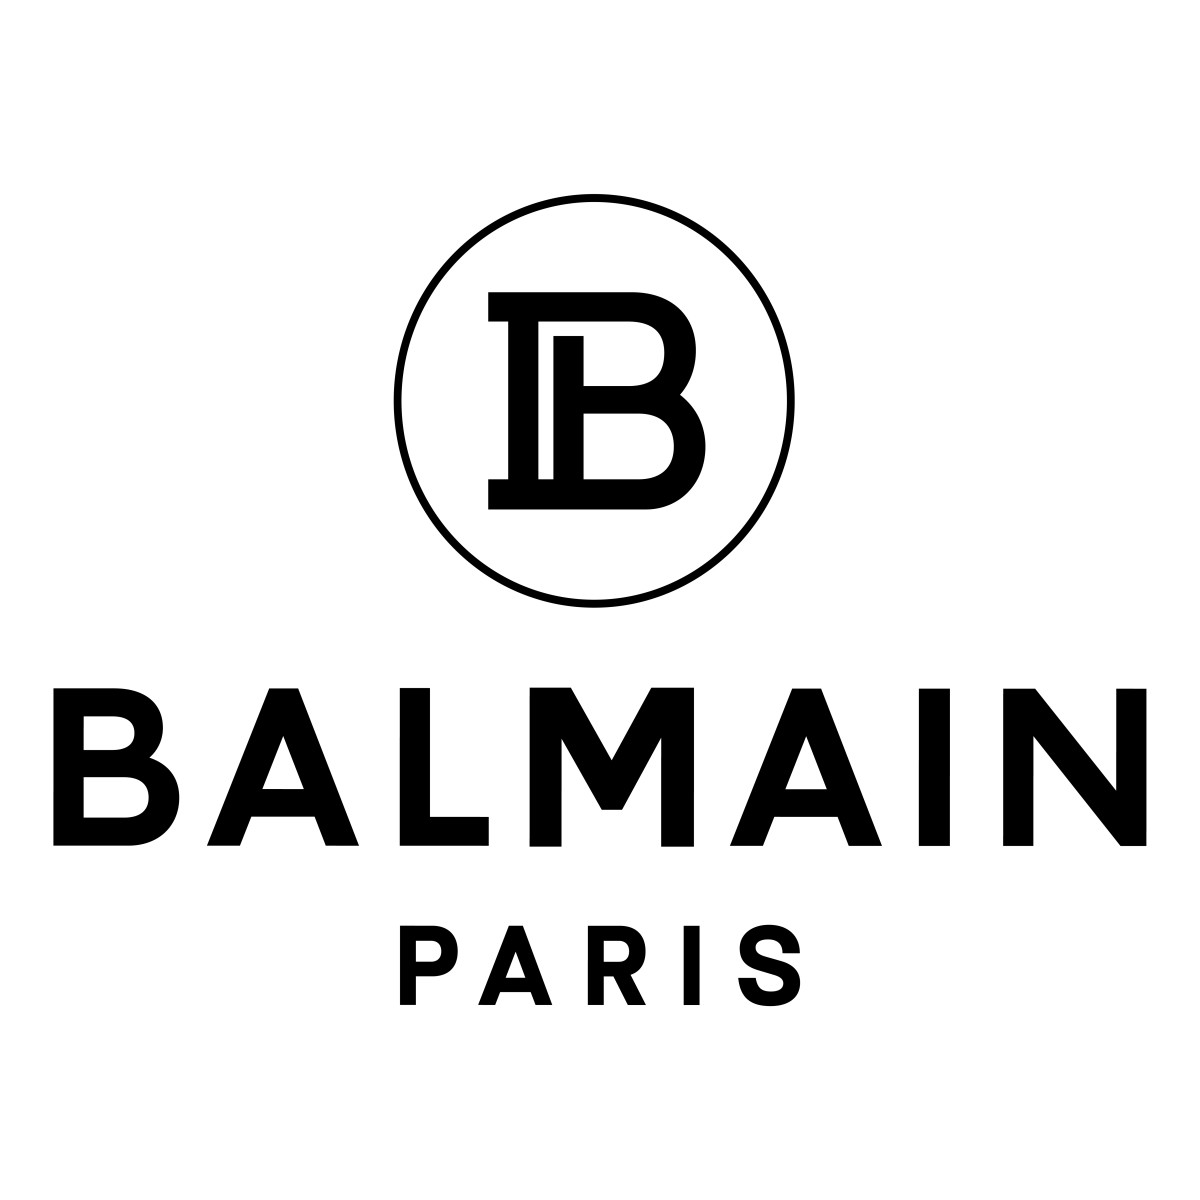 Balmain's new logo and monogram. Photo: Courtesy of Balmain